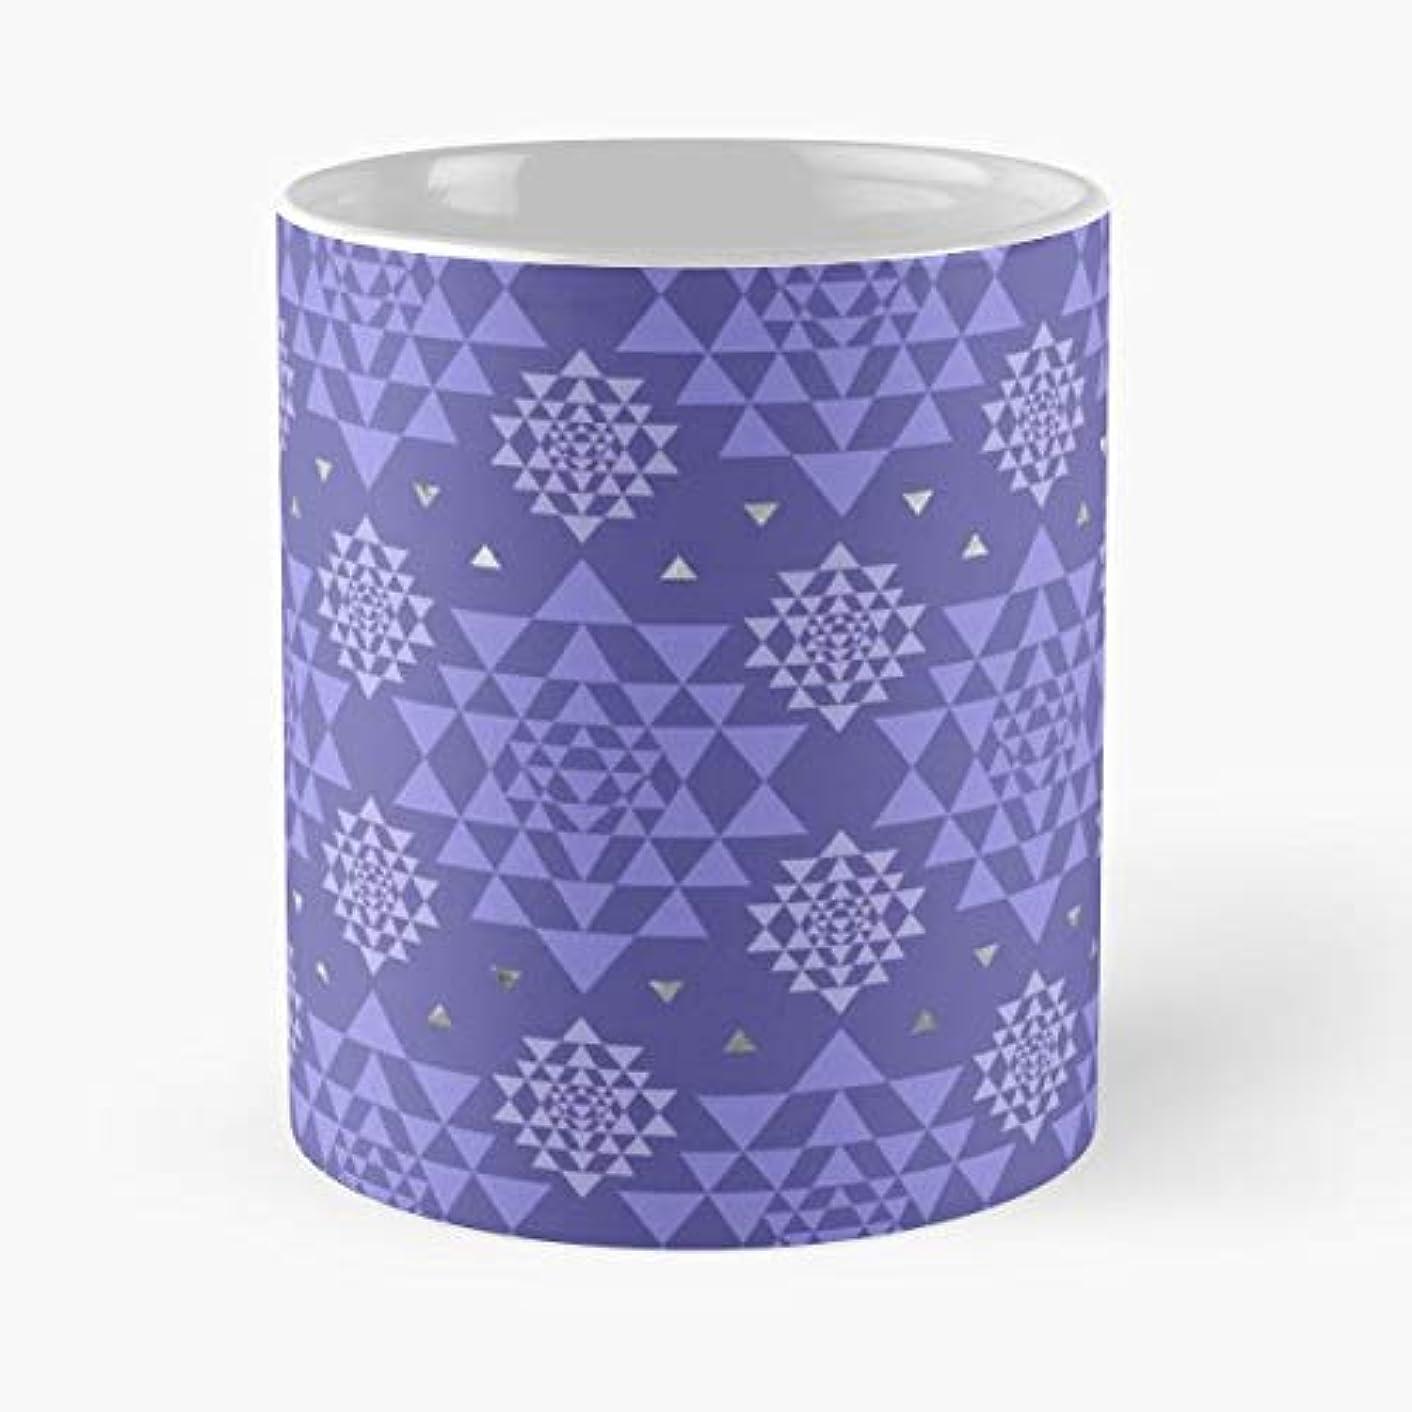 Sri Yantra Colors Shri Vidya Chakra - Morning Coffee Mug Ceramic Novelty, Funny Gift